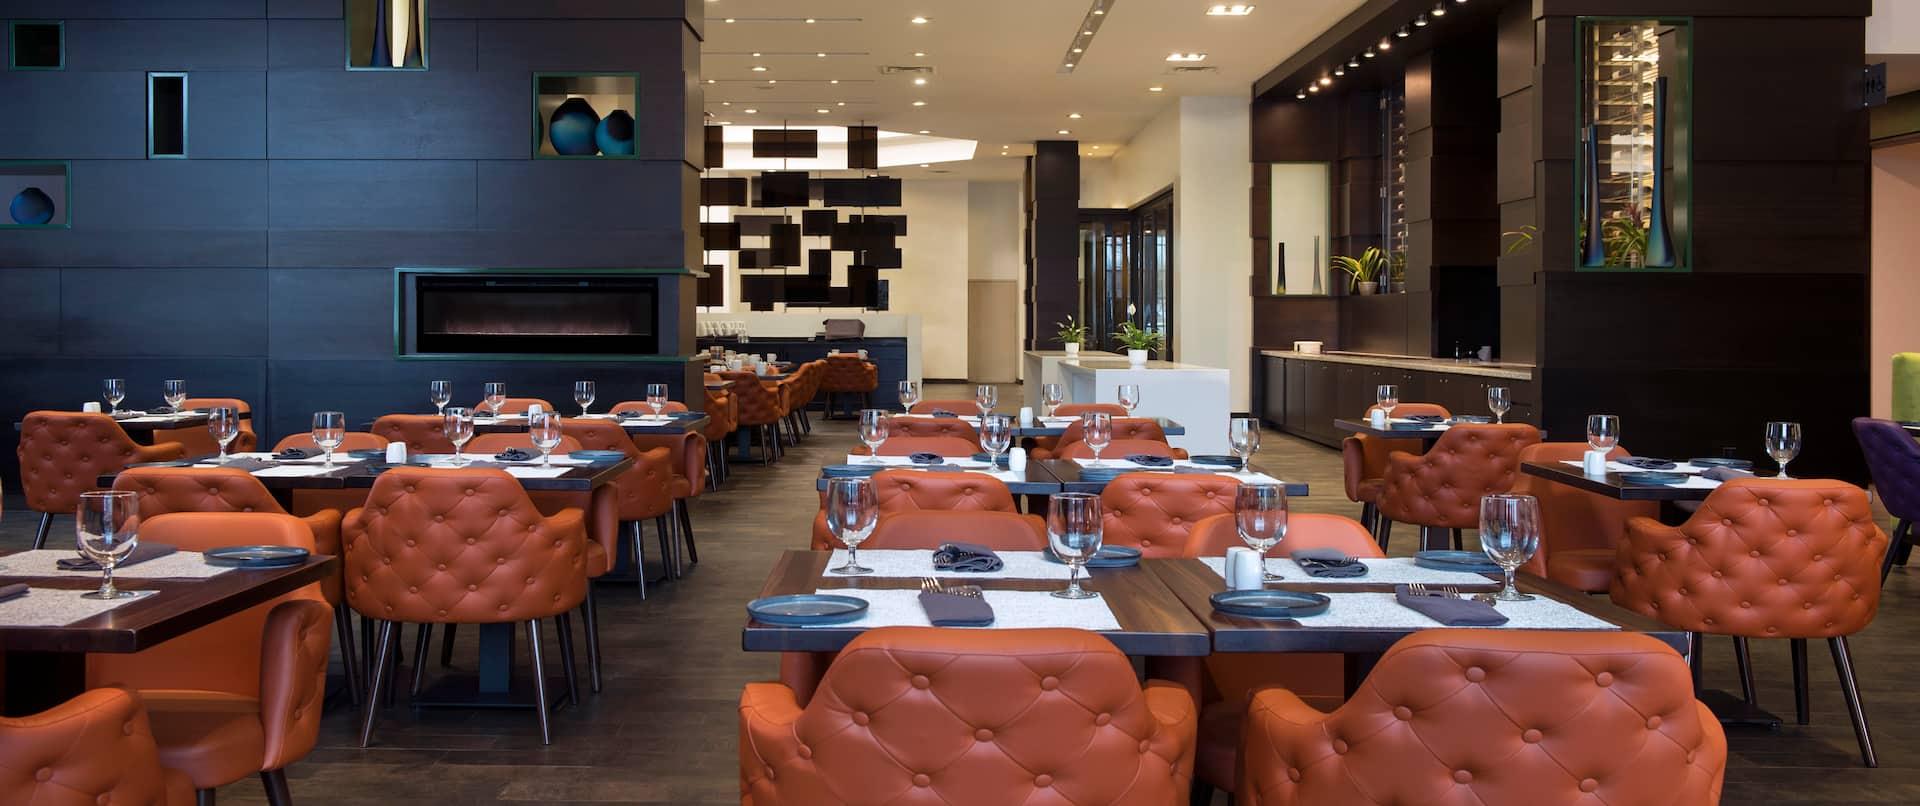 Essence of Unionville Restaurant Dining Area